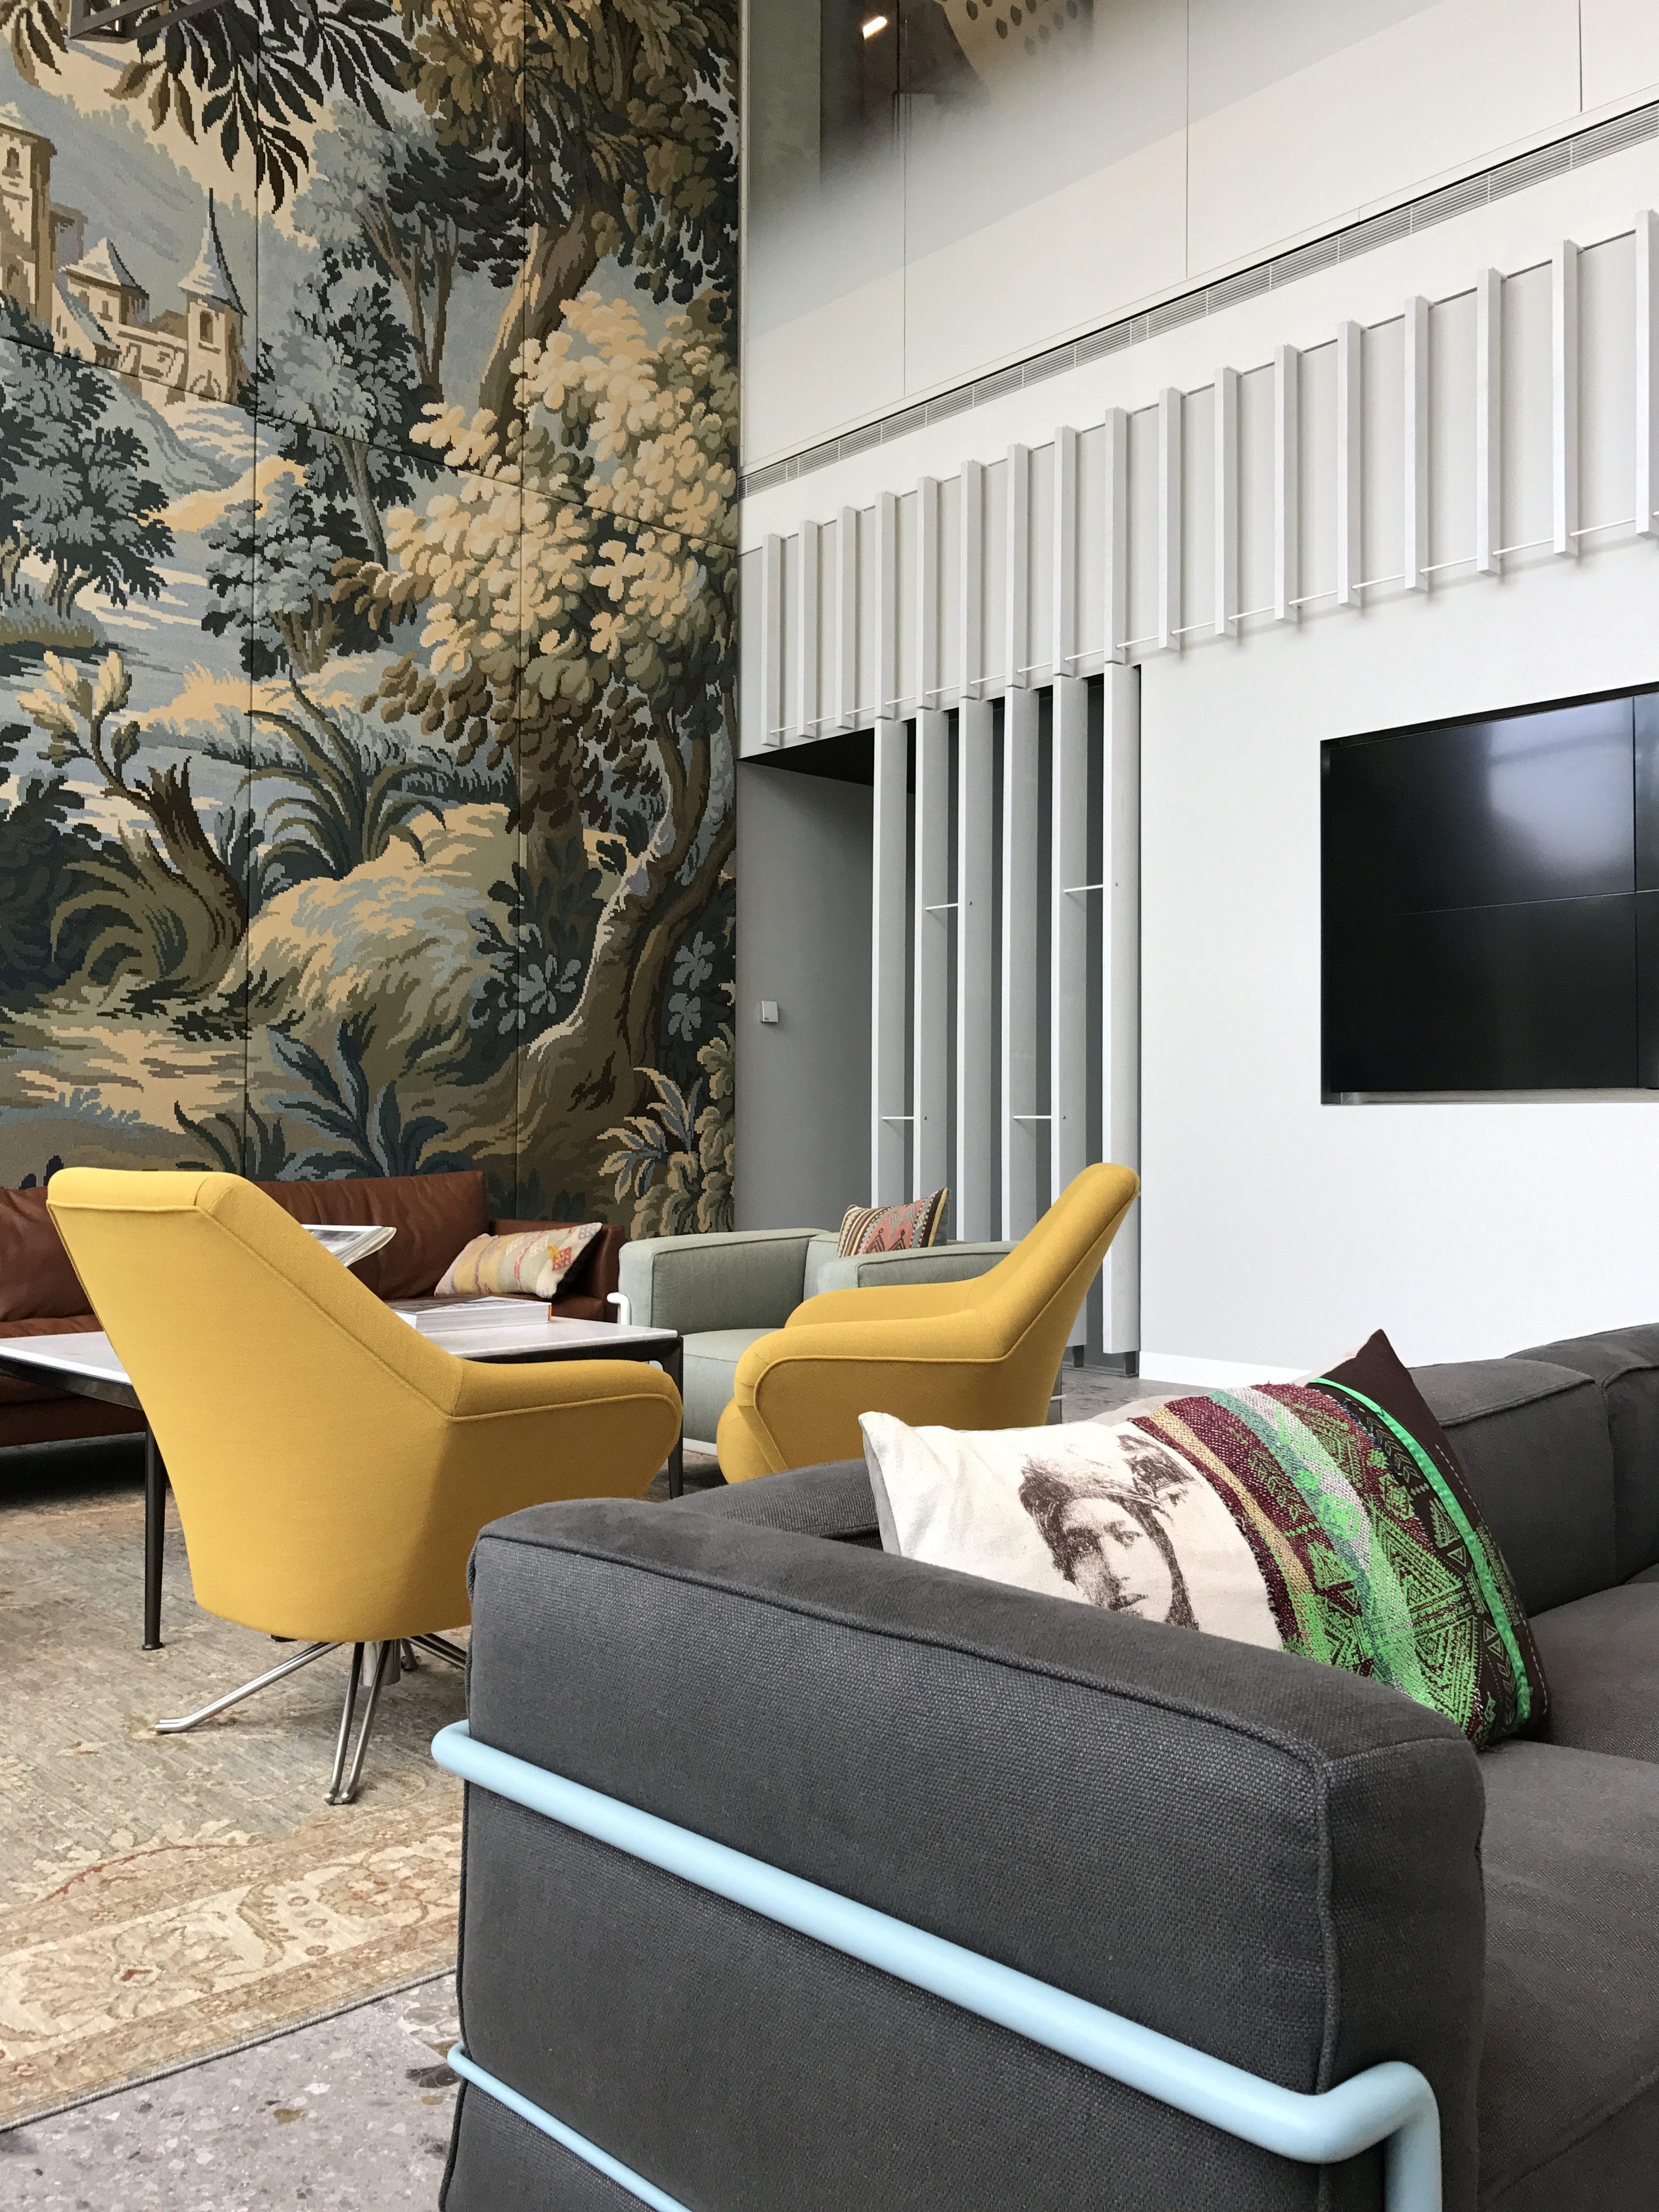 <p>ITO – Details lounge. Gemoderniseerde gewoven verdure, in kleur gespoten frames, styling. – Graziosi Progetti </p>